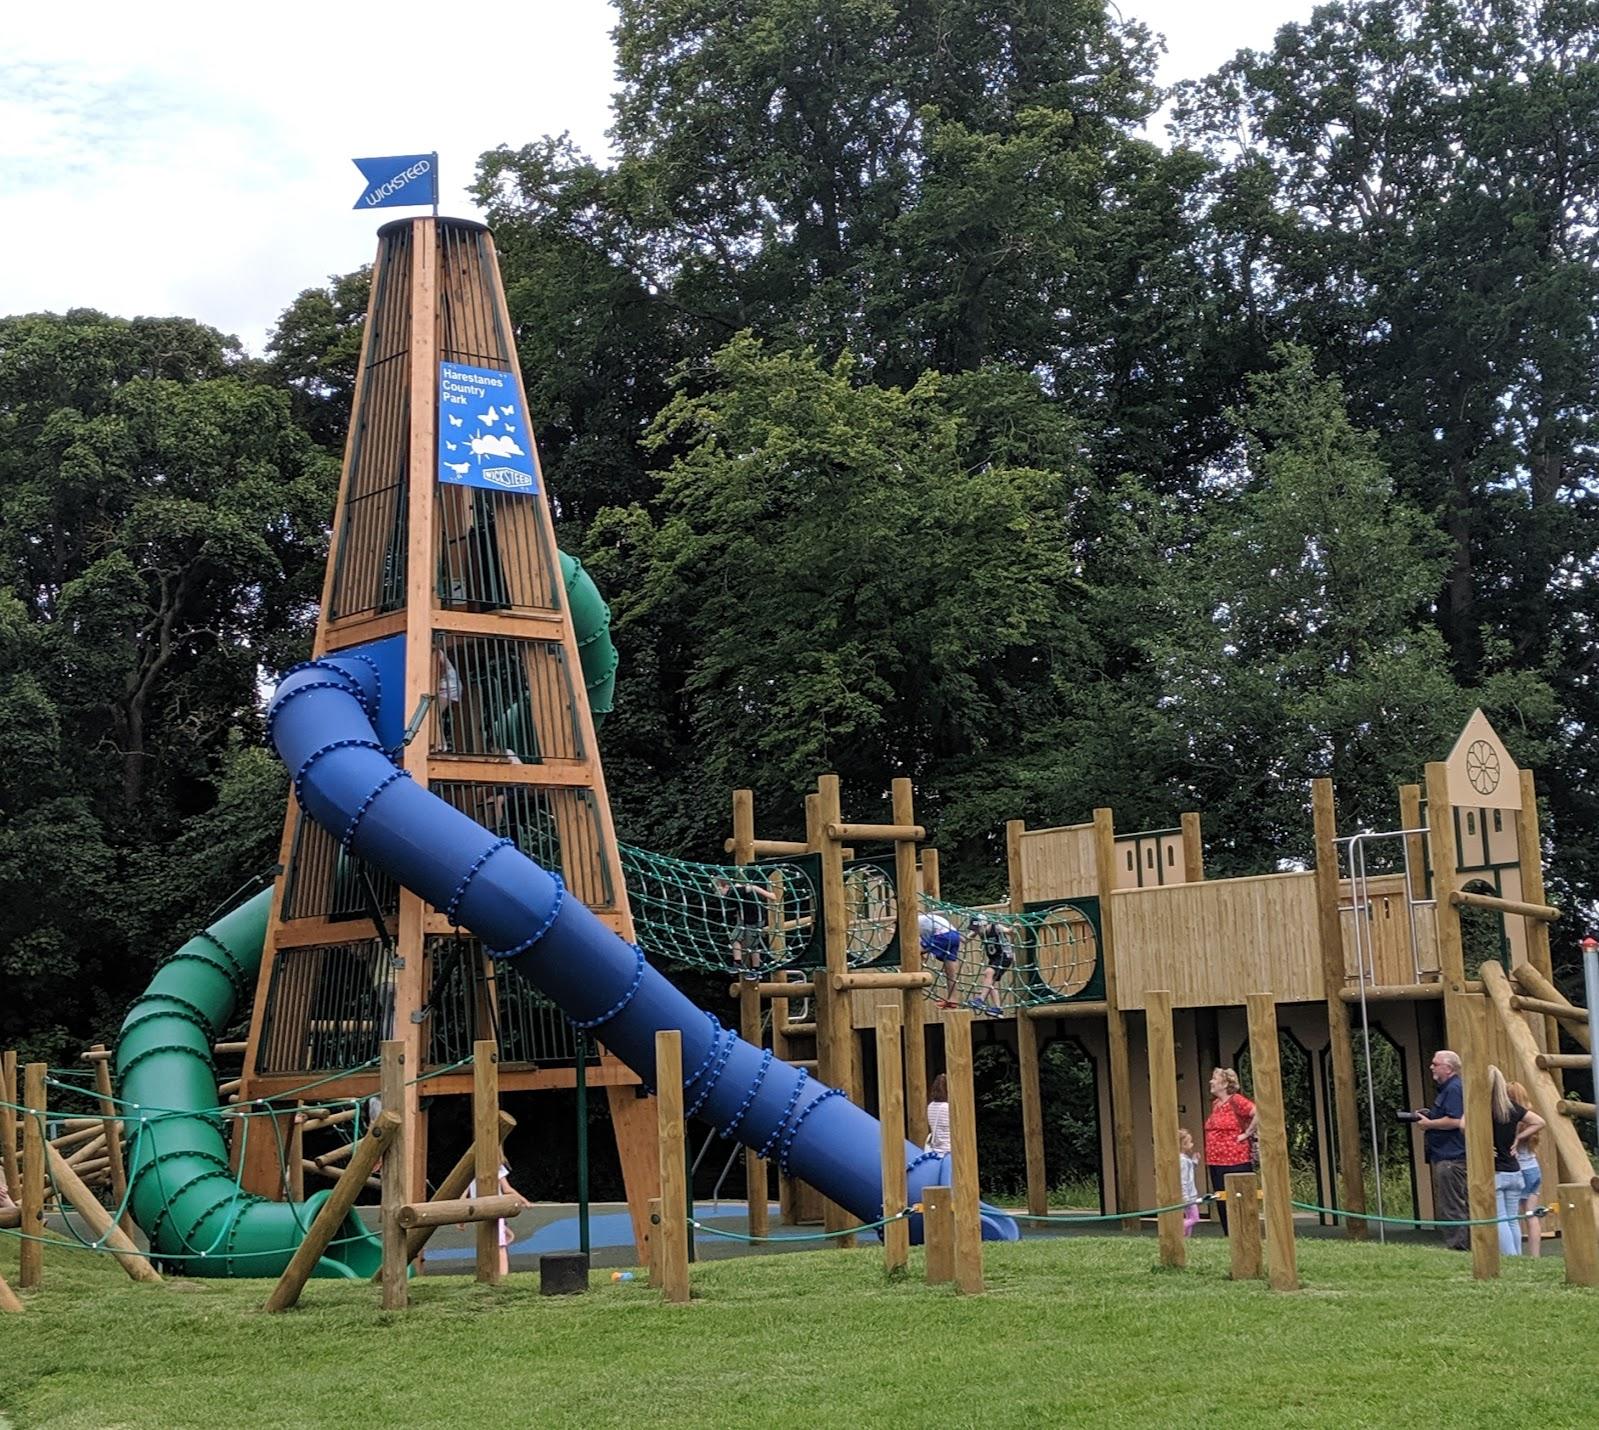 Harestanes Park, Jedburgh  - castle play area and slide